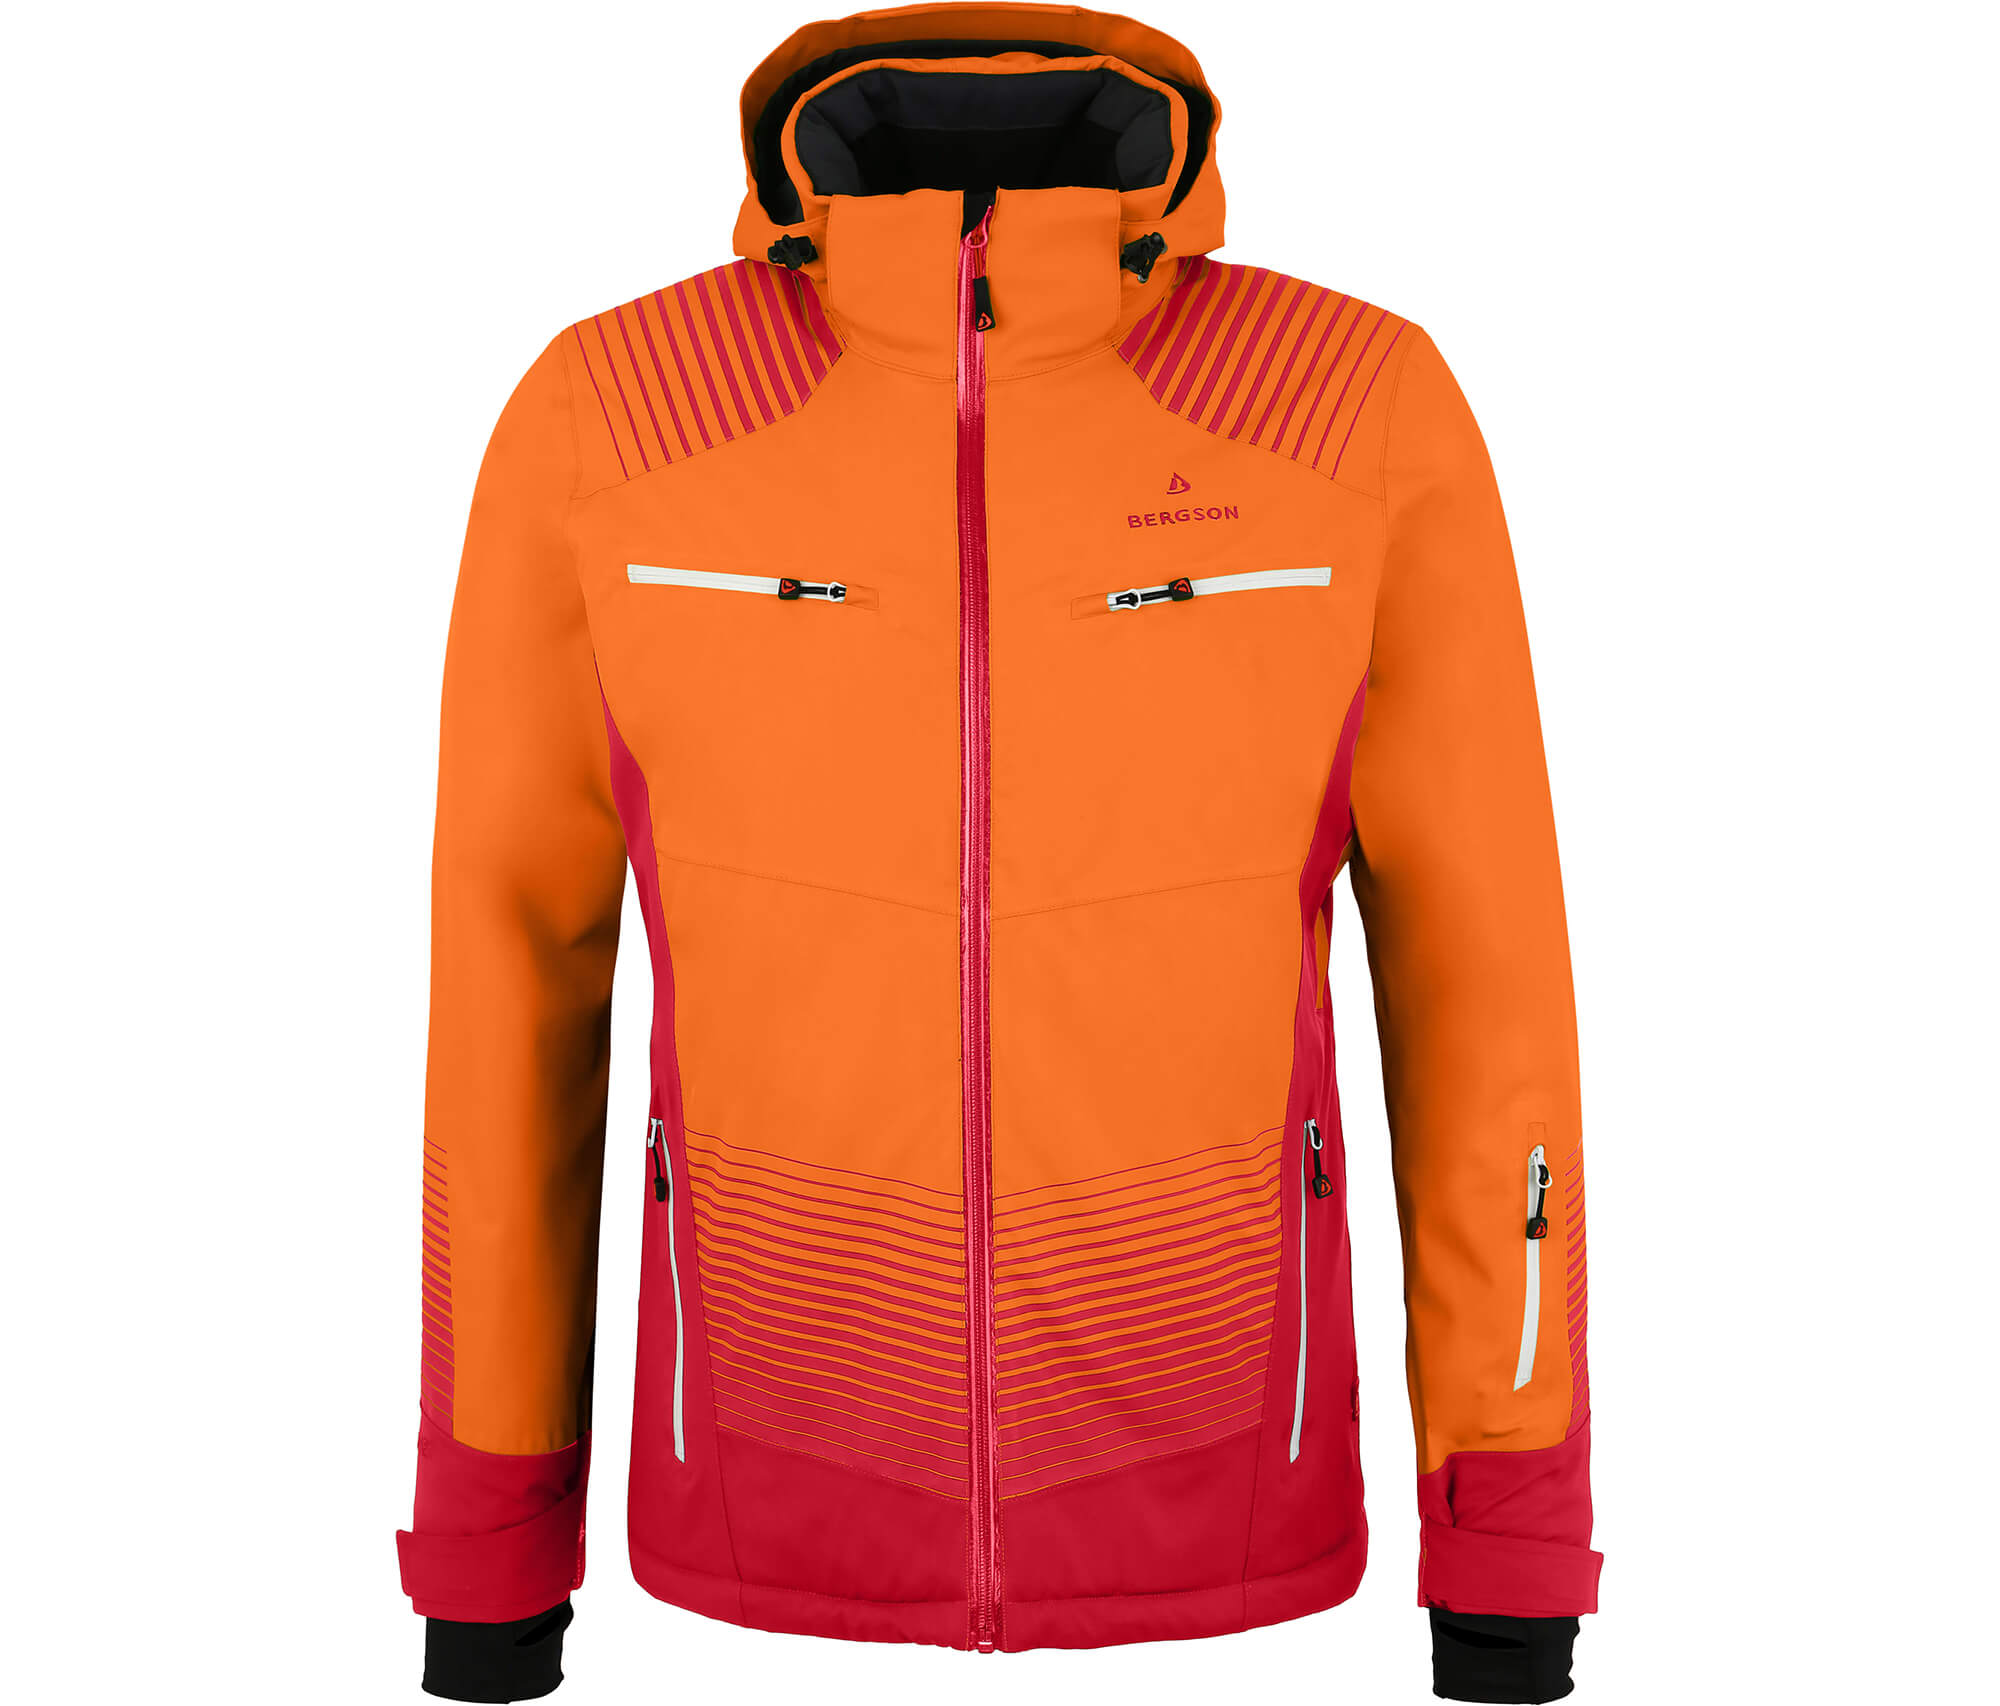 Bergson Herren Skijacke STEEL orange